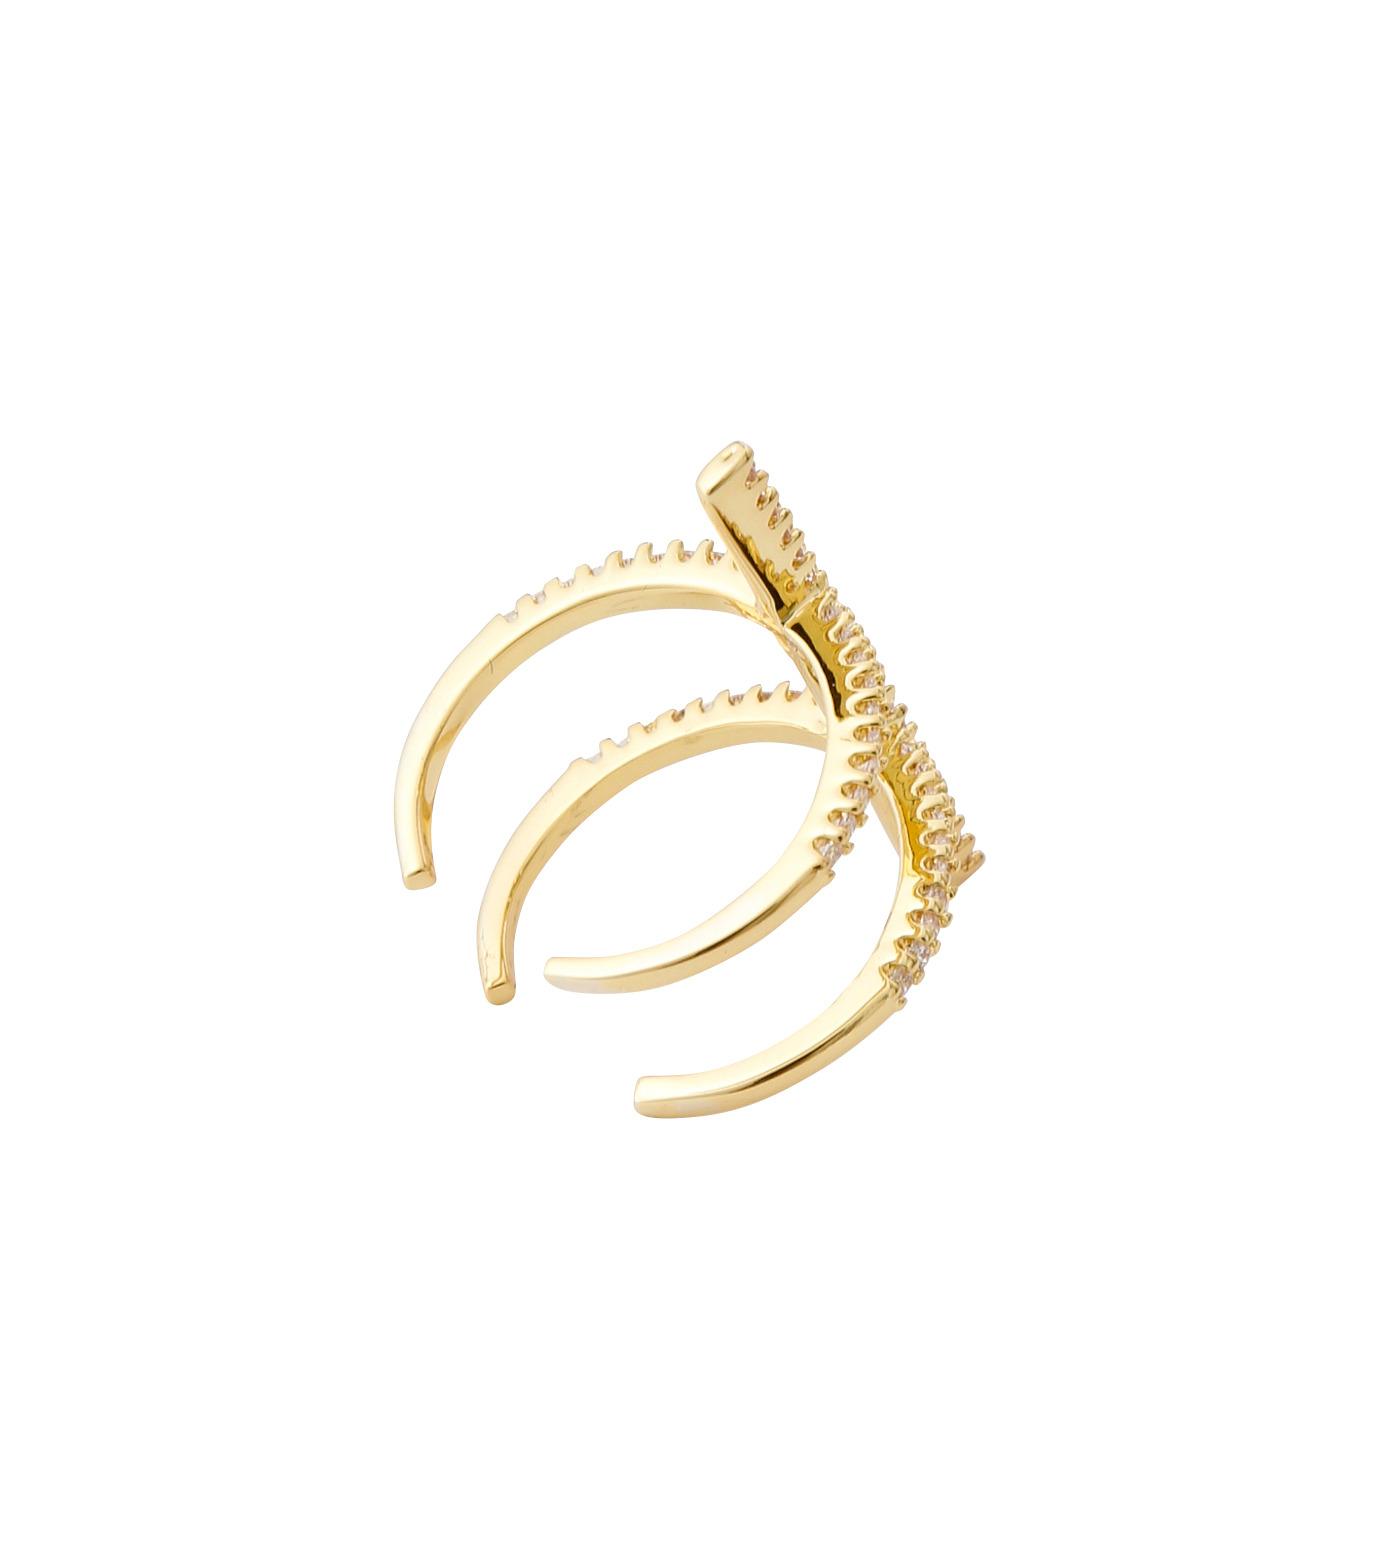 Fallon(ファロン)のPave Ladder Ring-GOLD(リング/ring)-FR21550-2 拡大詳細画像4